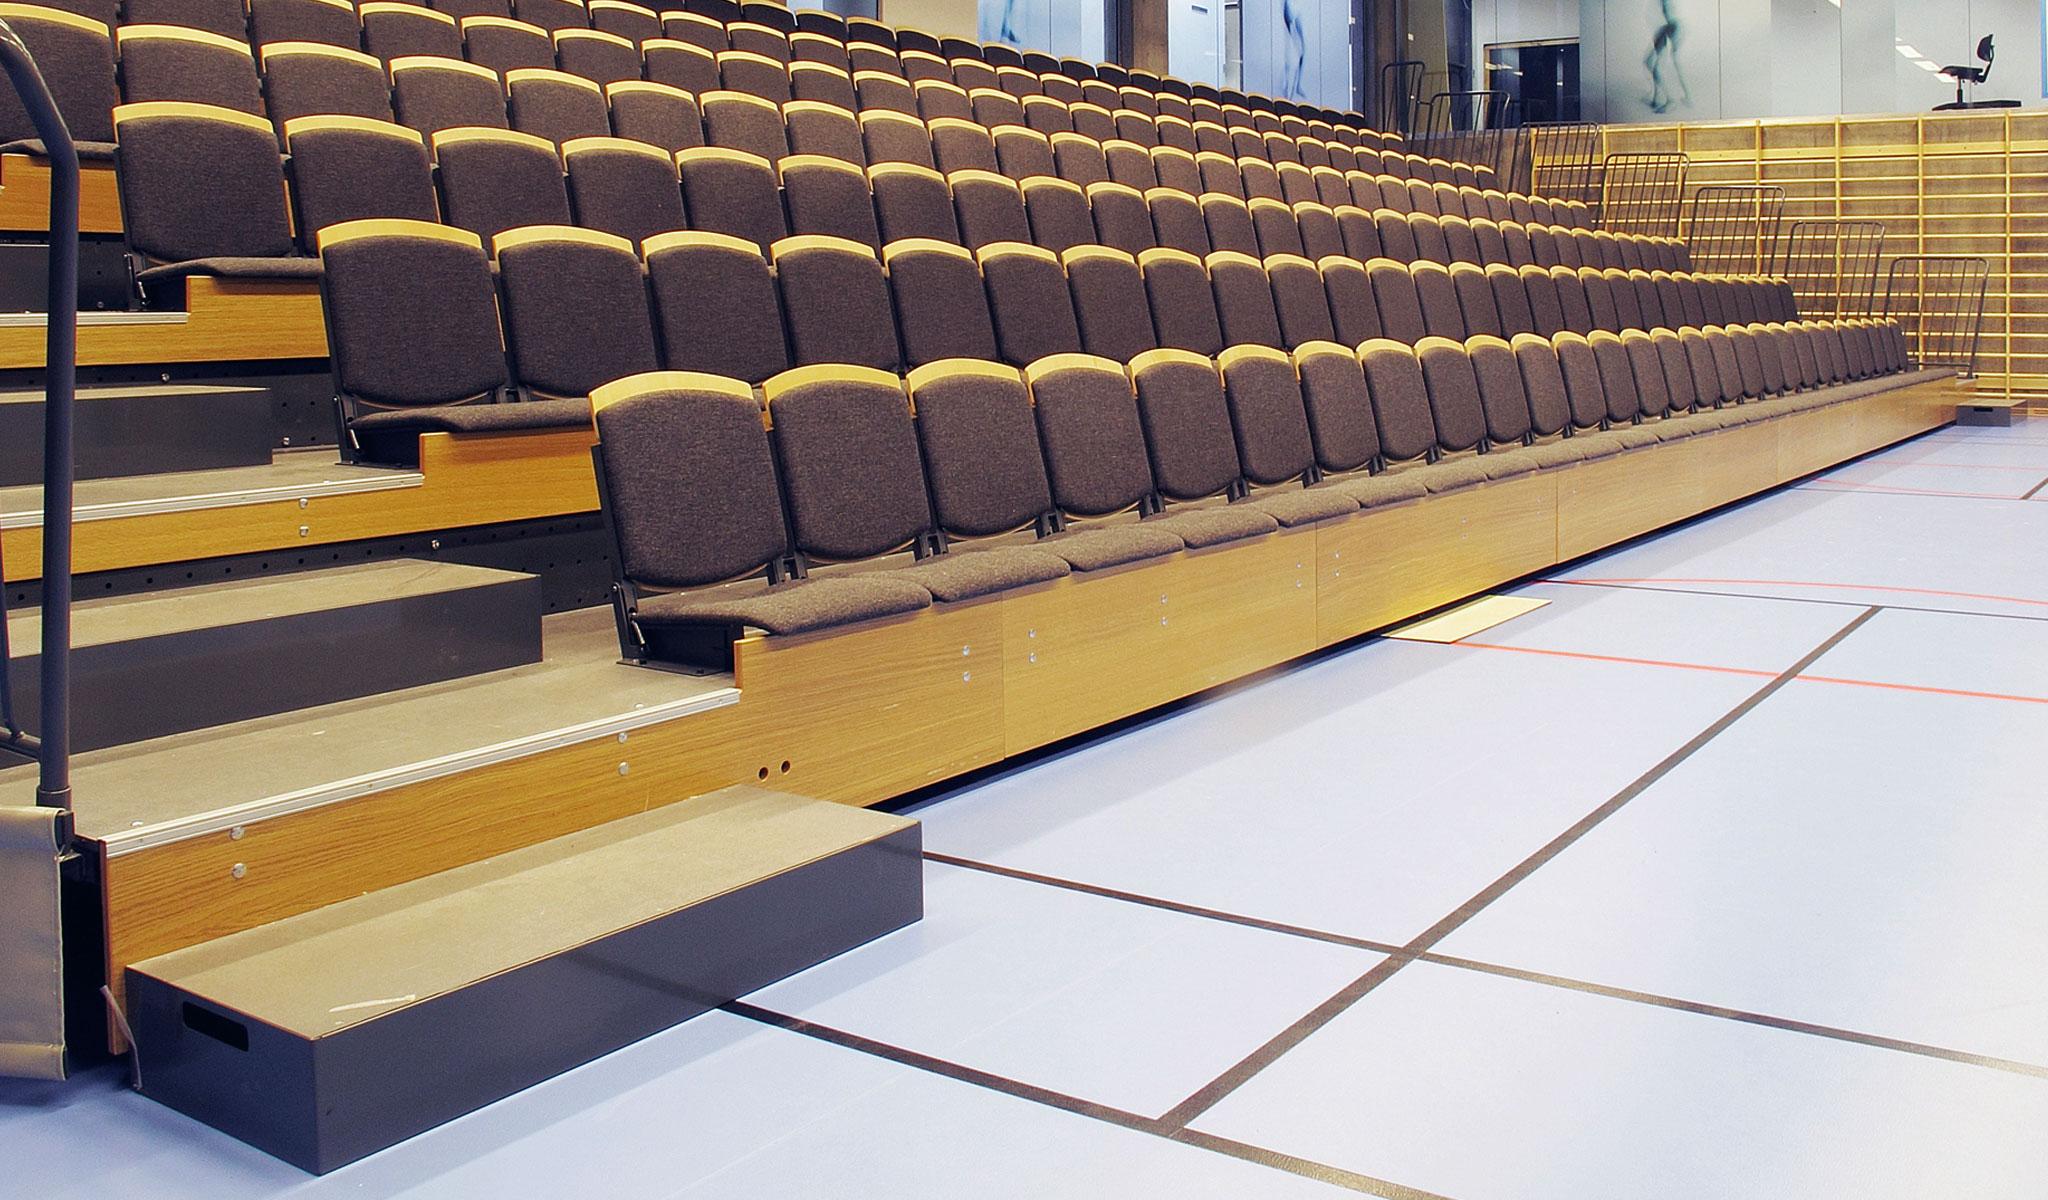 tribuenstole goal auto i tribunesæde